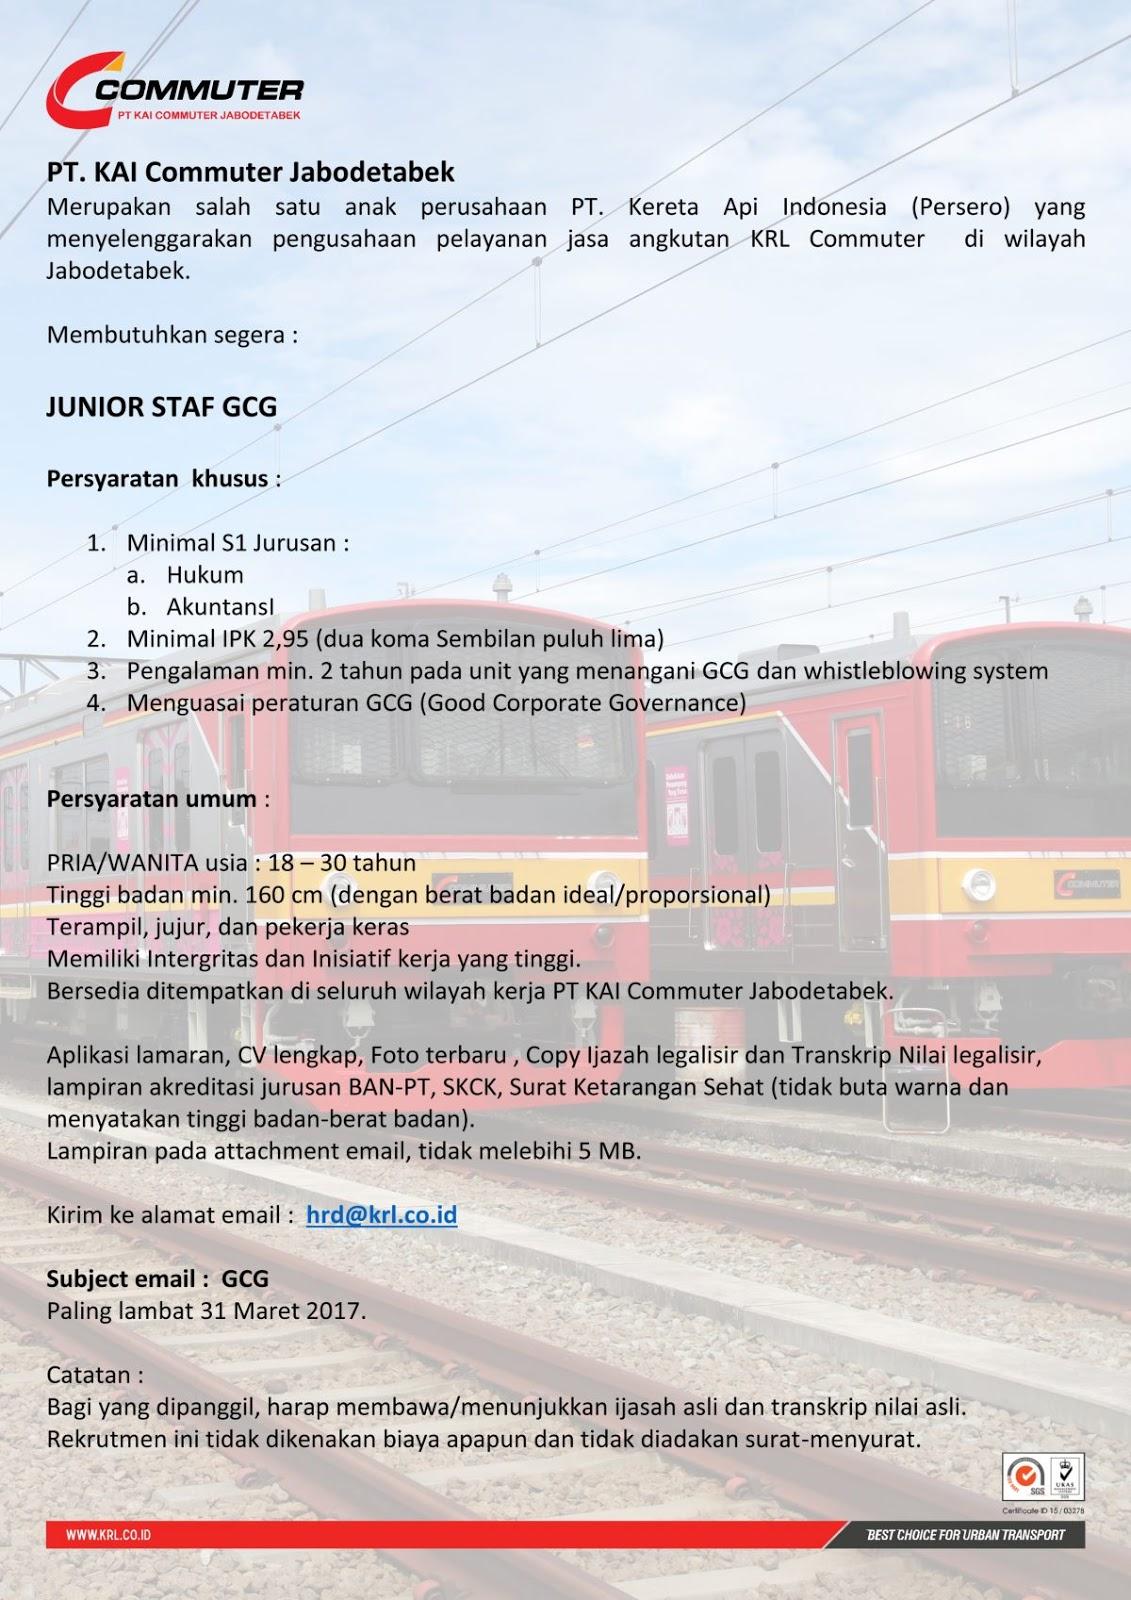 lokr pt kai commuter jabodetabel junior staff gcg 2017